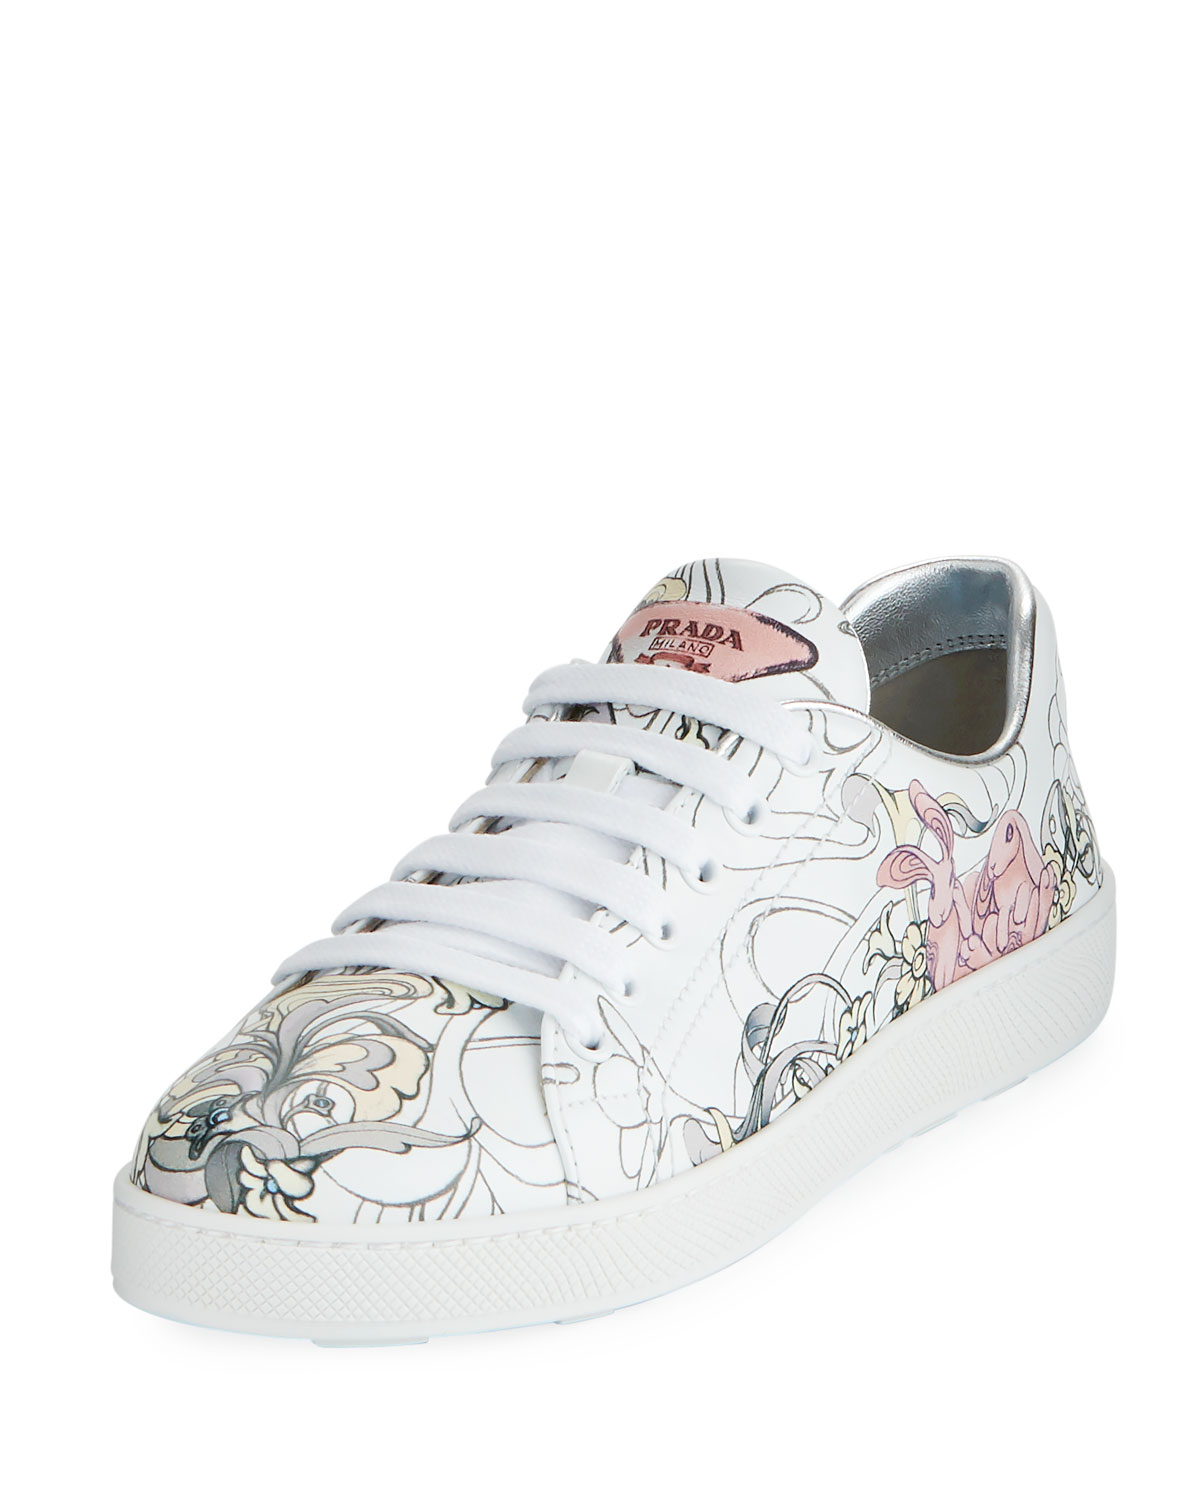 4a2d849266b9 Prada Rabbit-Print Leather Low-Top Sneakers